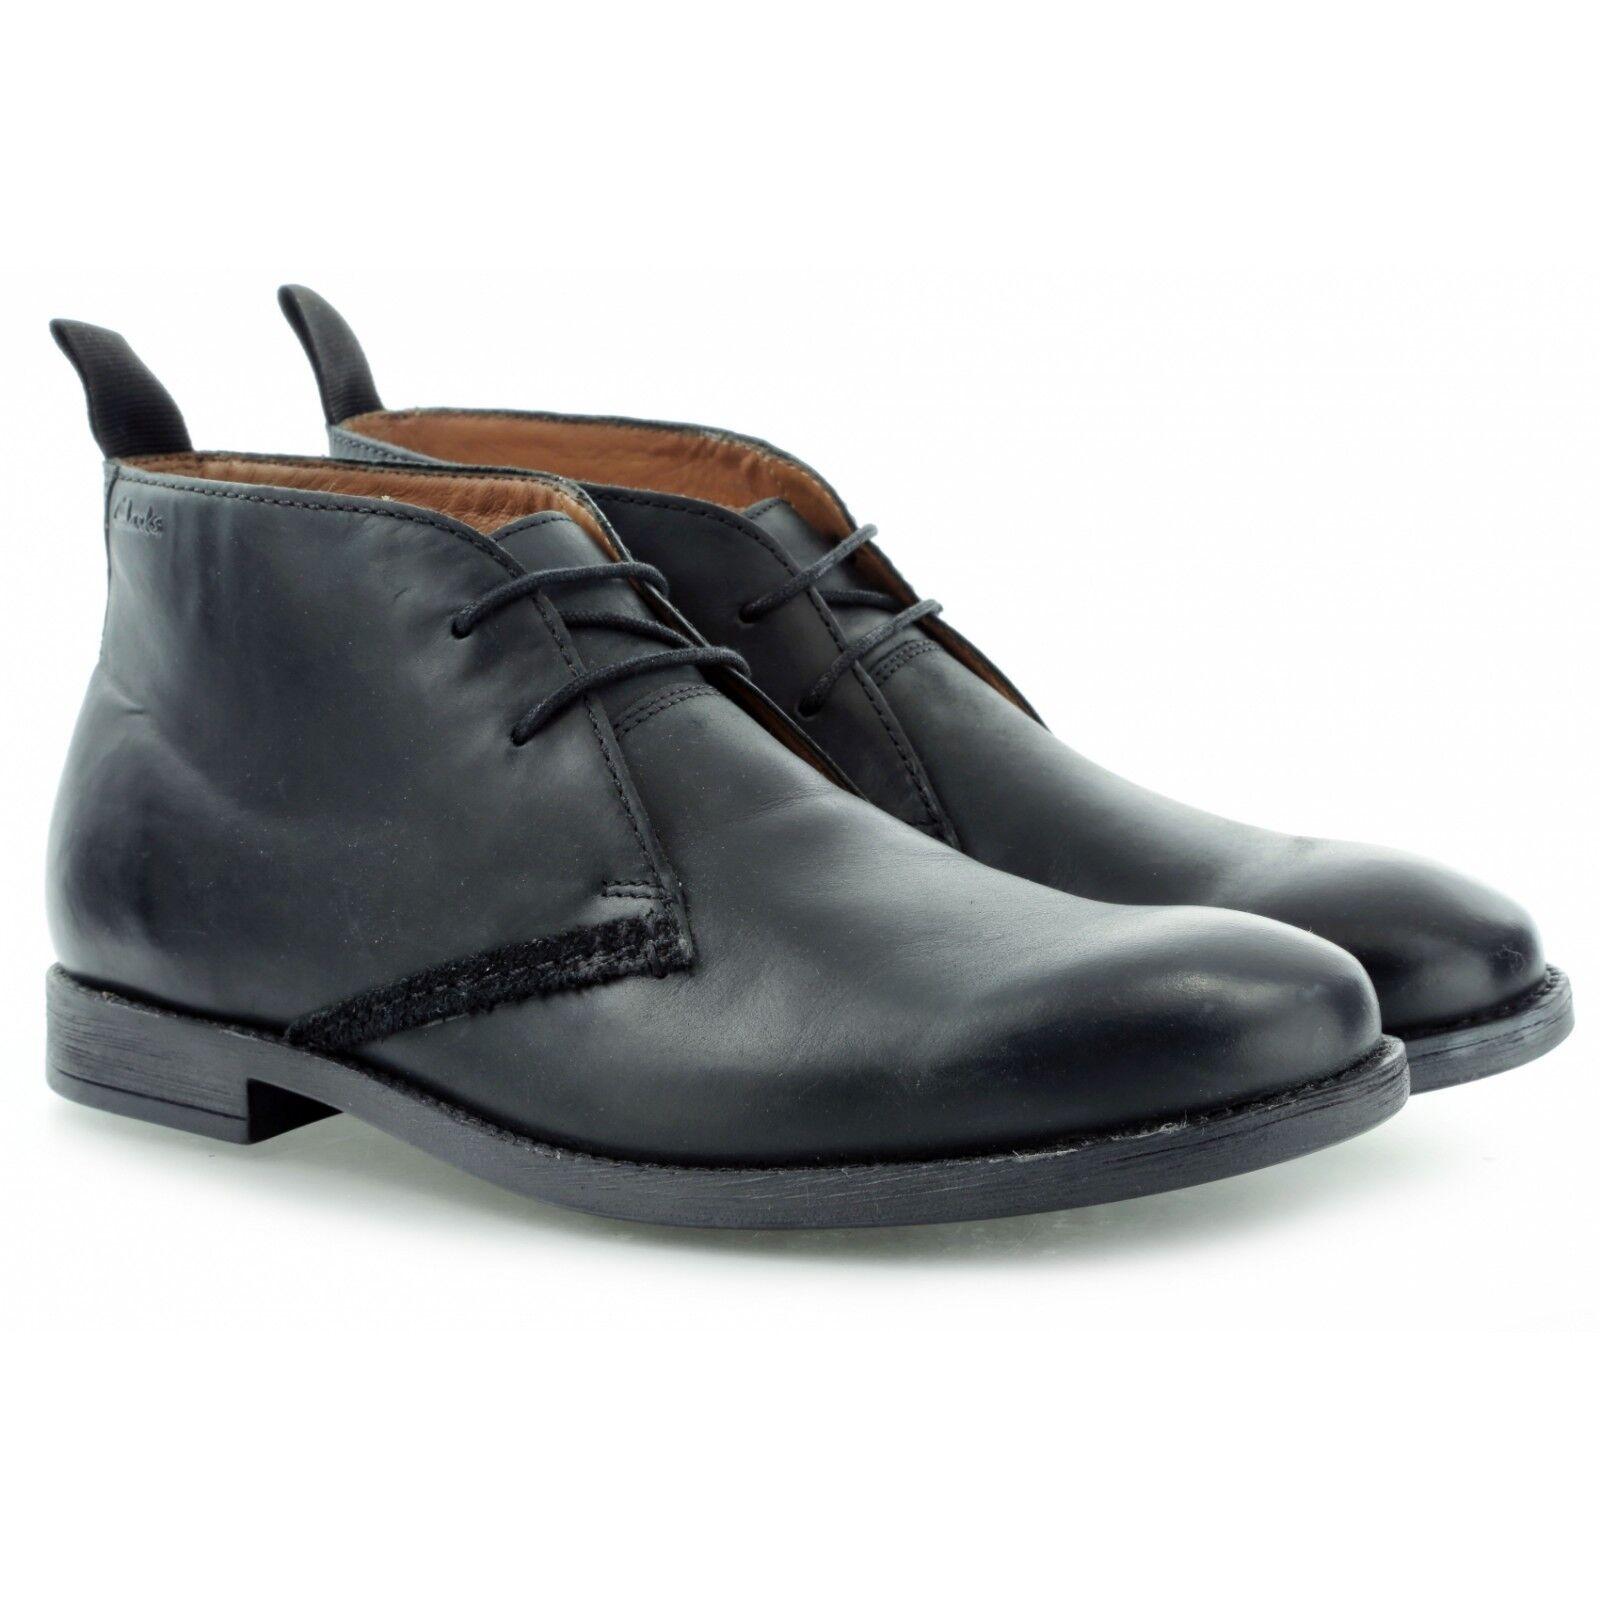 Clarks Hombre  Novato Medio Negro Lea, ve Vintage se ve Lea,  Reino Unido 6,7,9,10 G 8ce2bc